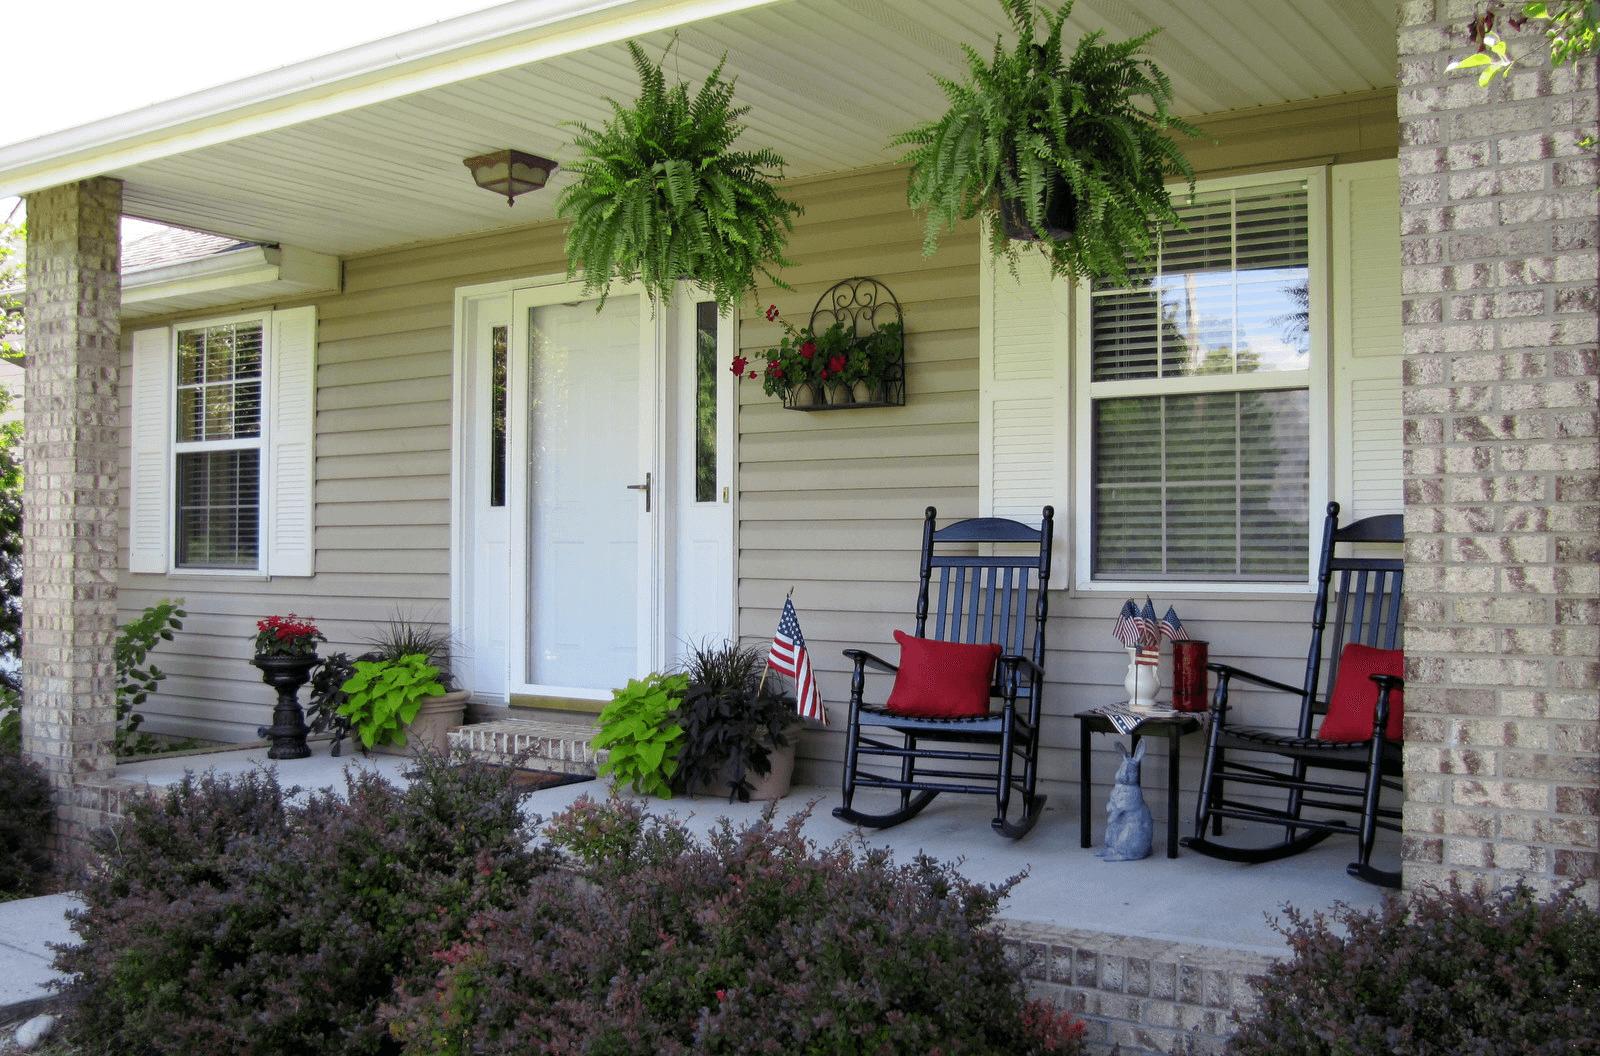 Small Front Porch Decorating Ideas Home Plans Blueprints 111529